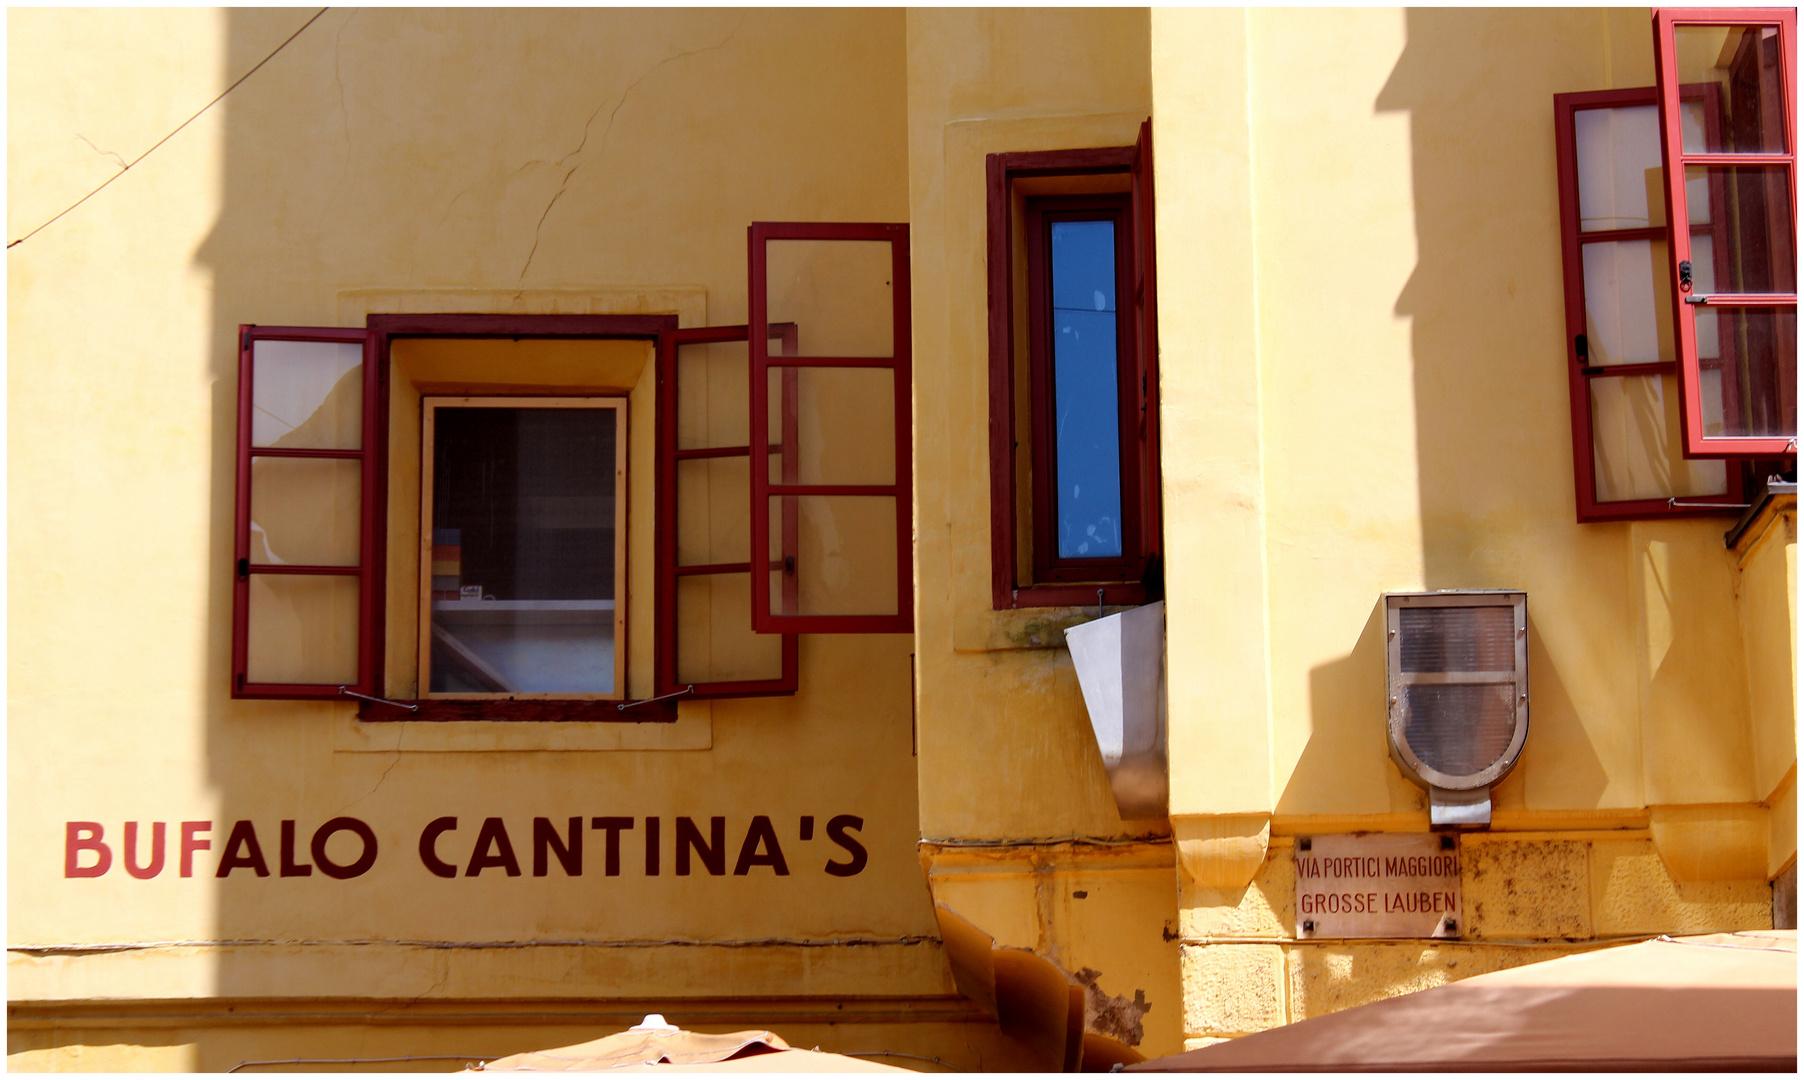 Bufalo Cantina